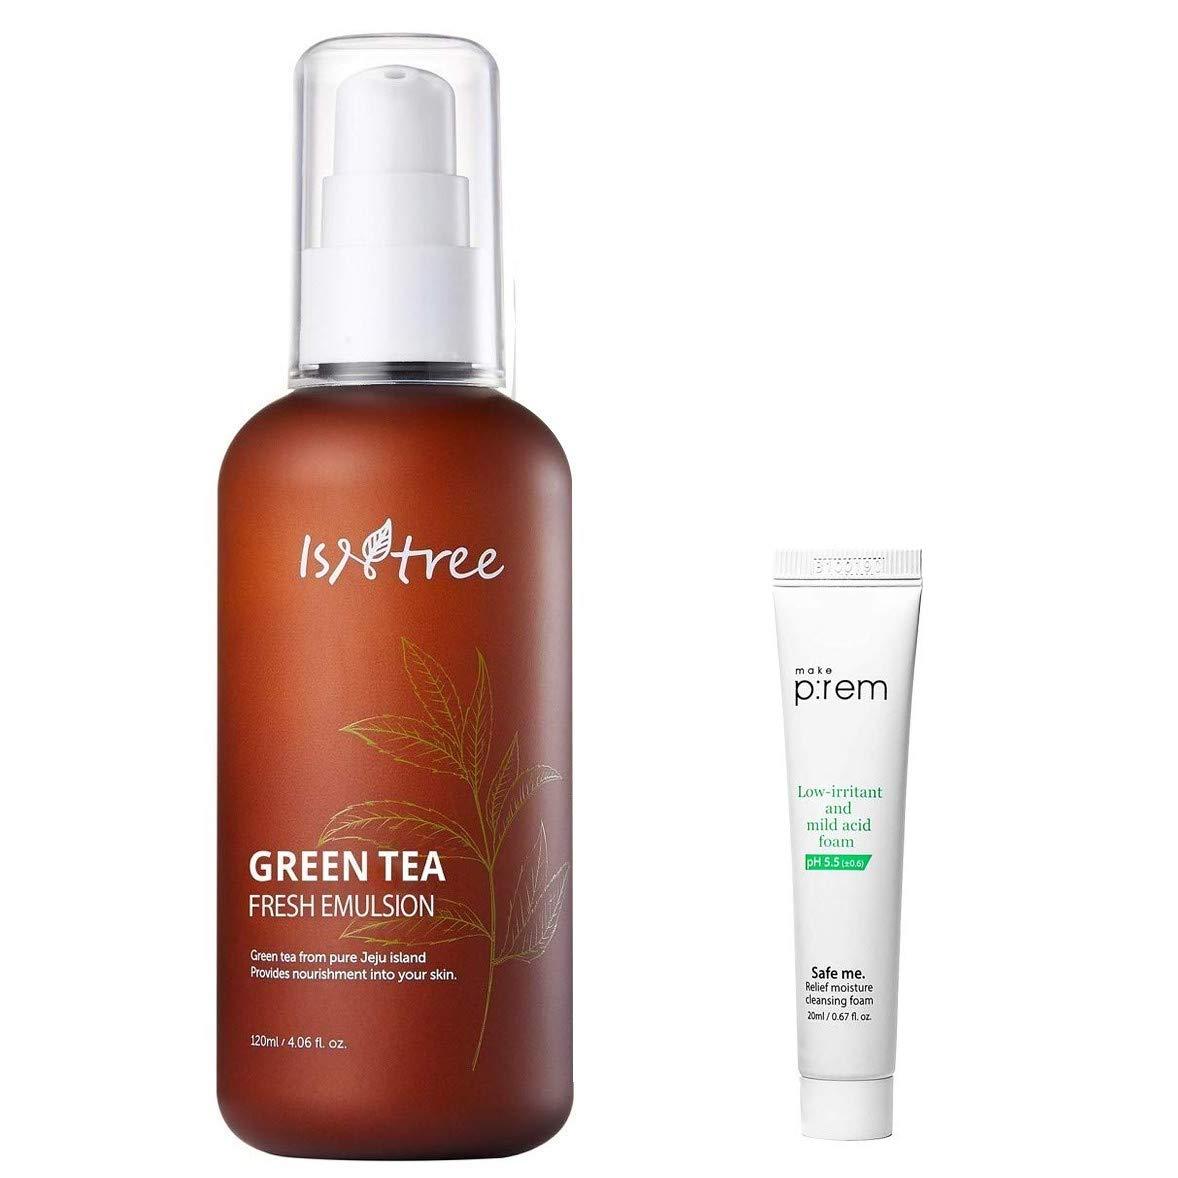 ISNTREE Green Tea Fresh Facial Emulsion 120ml, 4.06 fl. oz. with Cleansing Foam Mini | Deep Moisturizing | Sebum Control | Refreshing| Fine Skin Texture | Hypoallergenic | Dermatologist Tested |